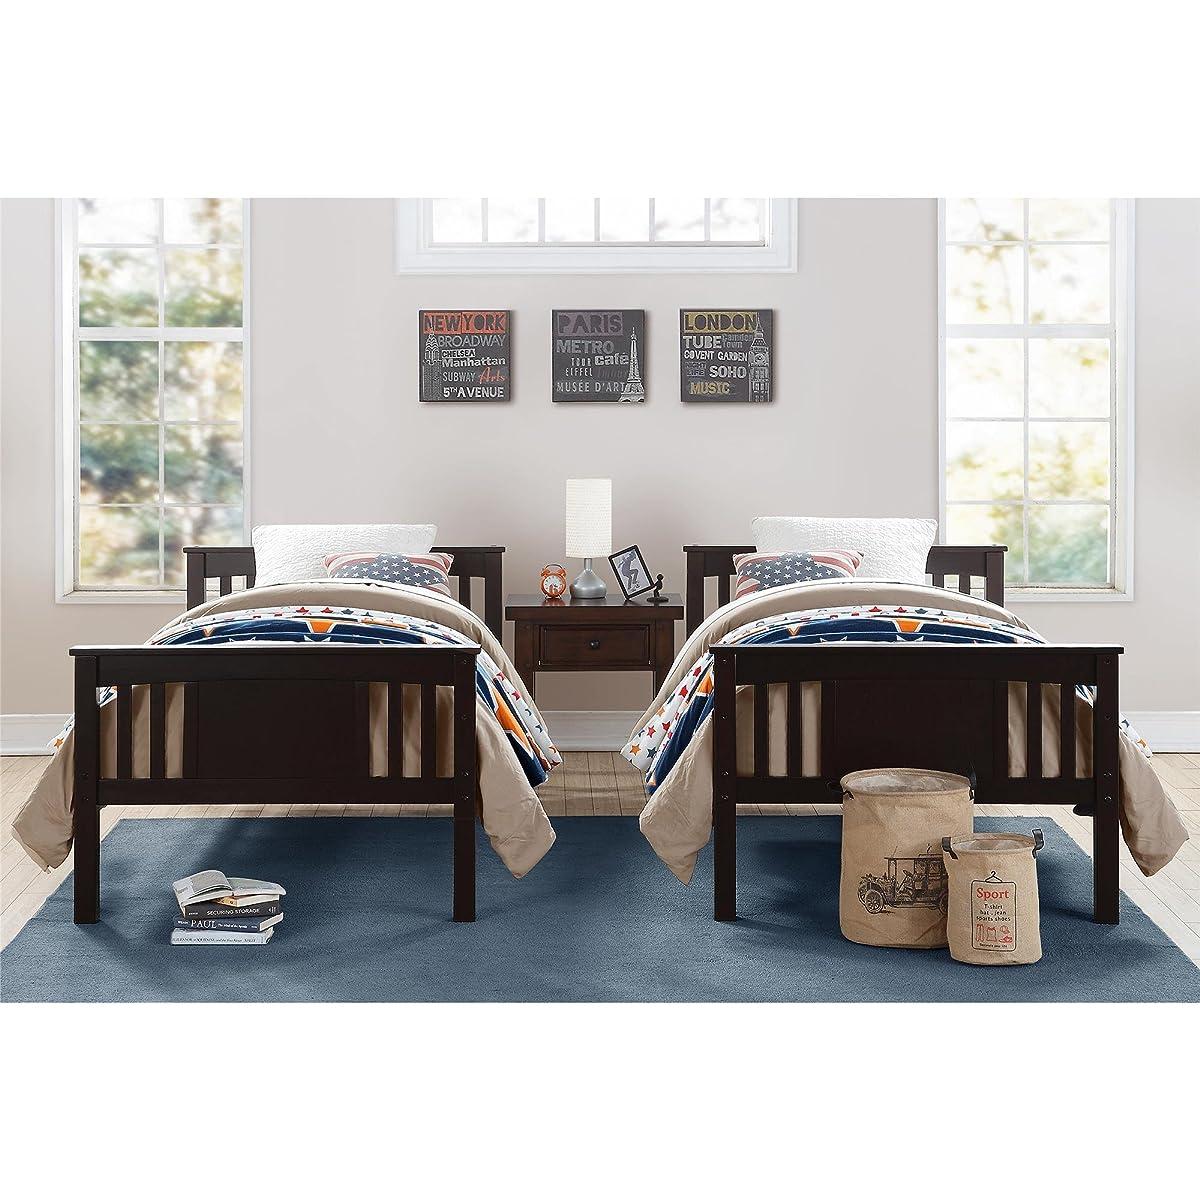 Dorel Living Dylan Bunk Bed, Twin, Espresso